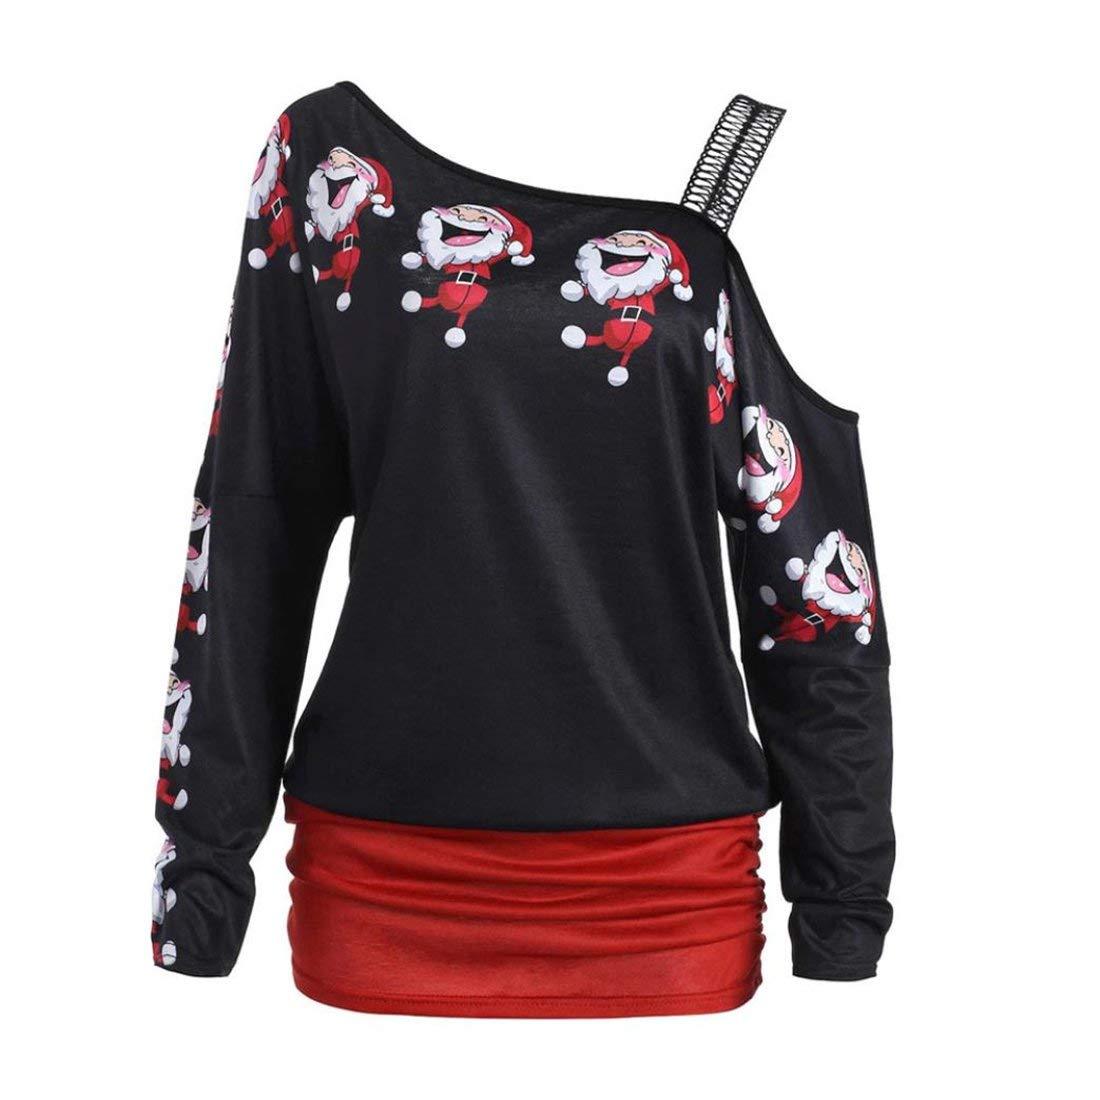 eab932ec99cd4 Get Quotations · HANYI Women Christmas Snowflake Print Long Sleeve Off  Shoulder Tunic Sweatshirt T-shirt Blouse Dress